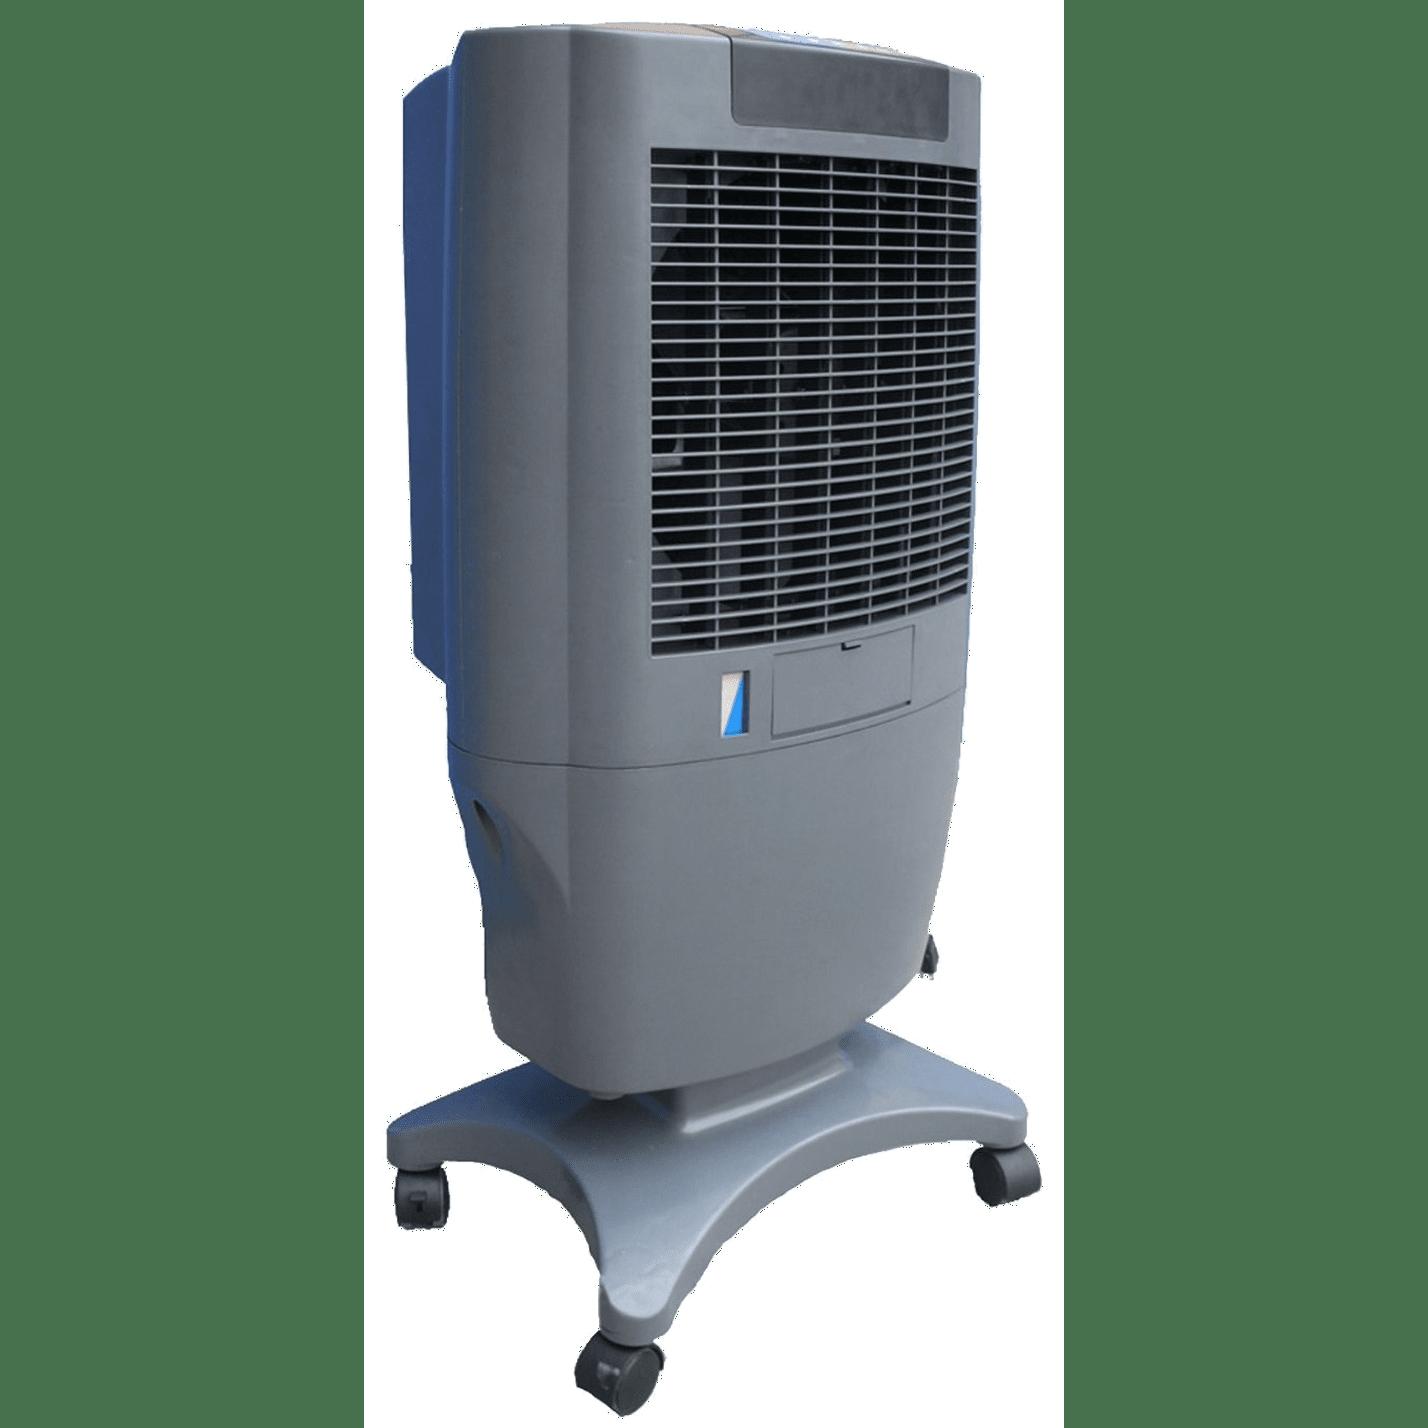 Swamp Cooler Media : Champion cp ultracool evaporative cooler sylvane